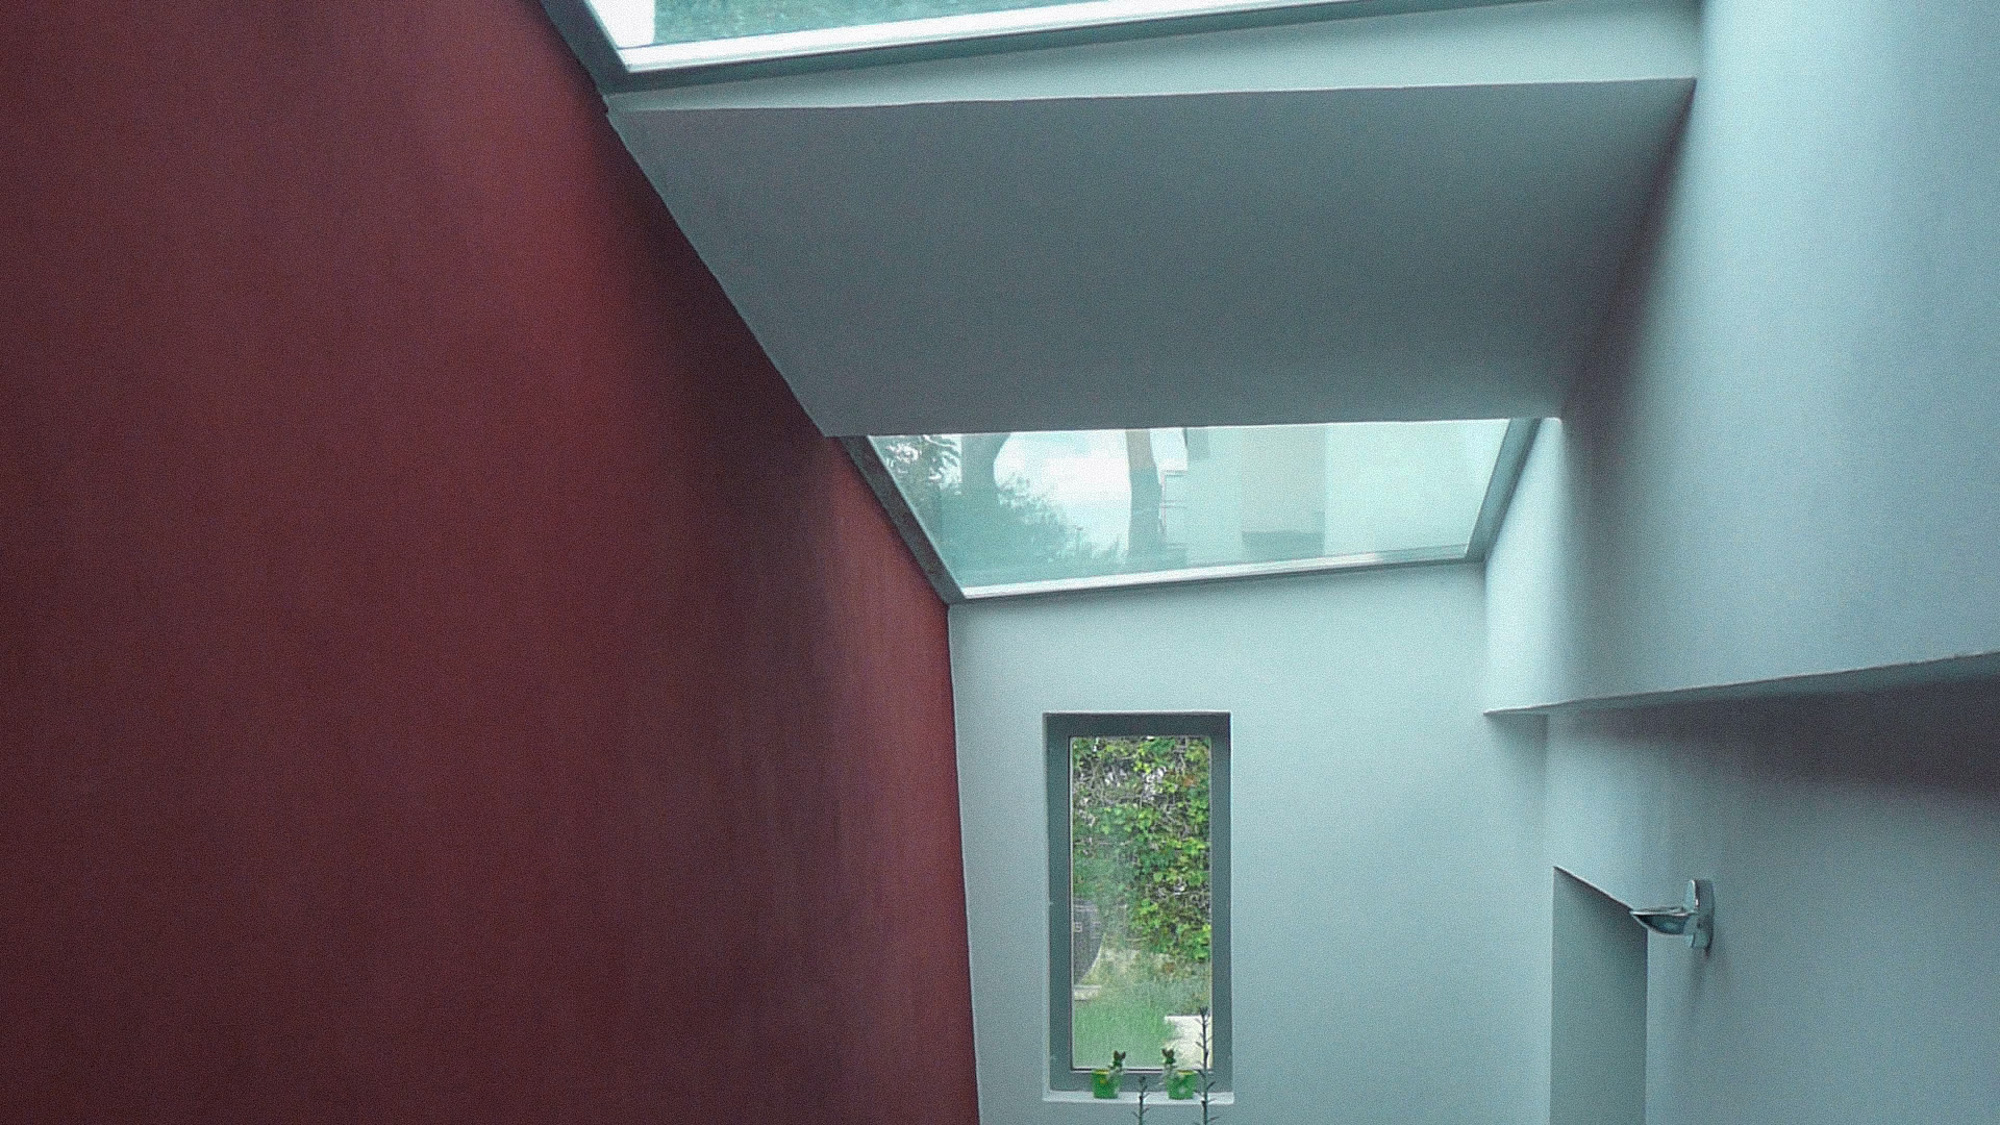 Studio Architettura Garzia